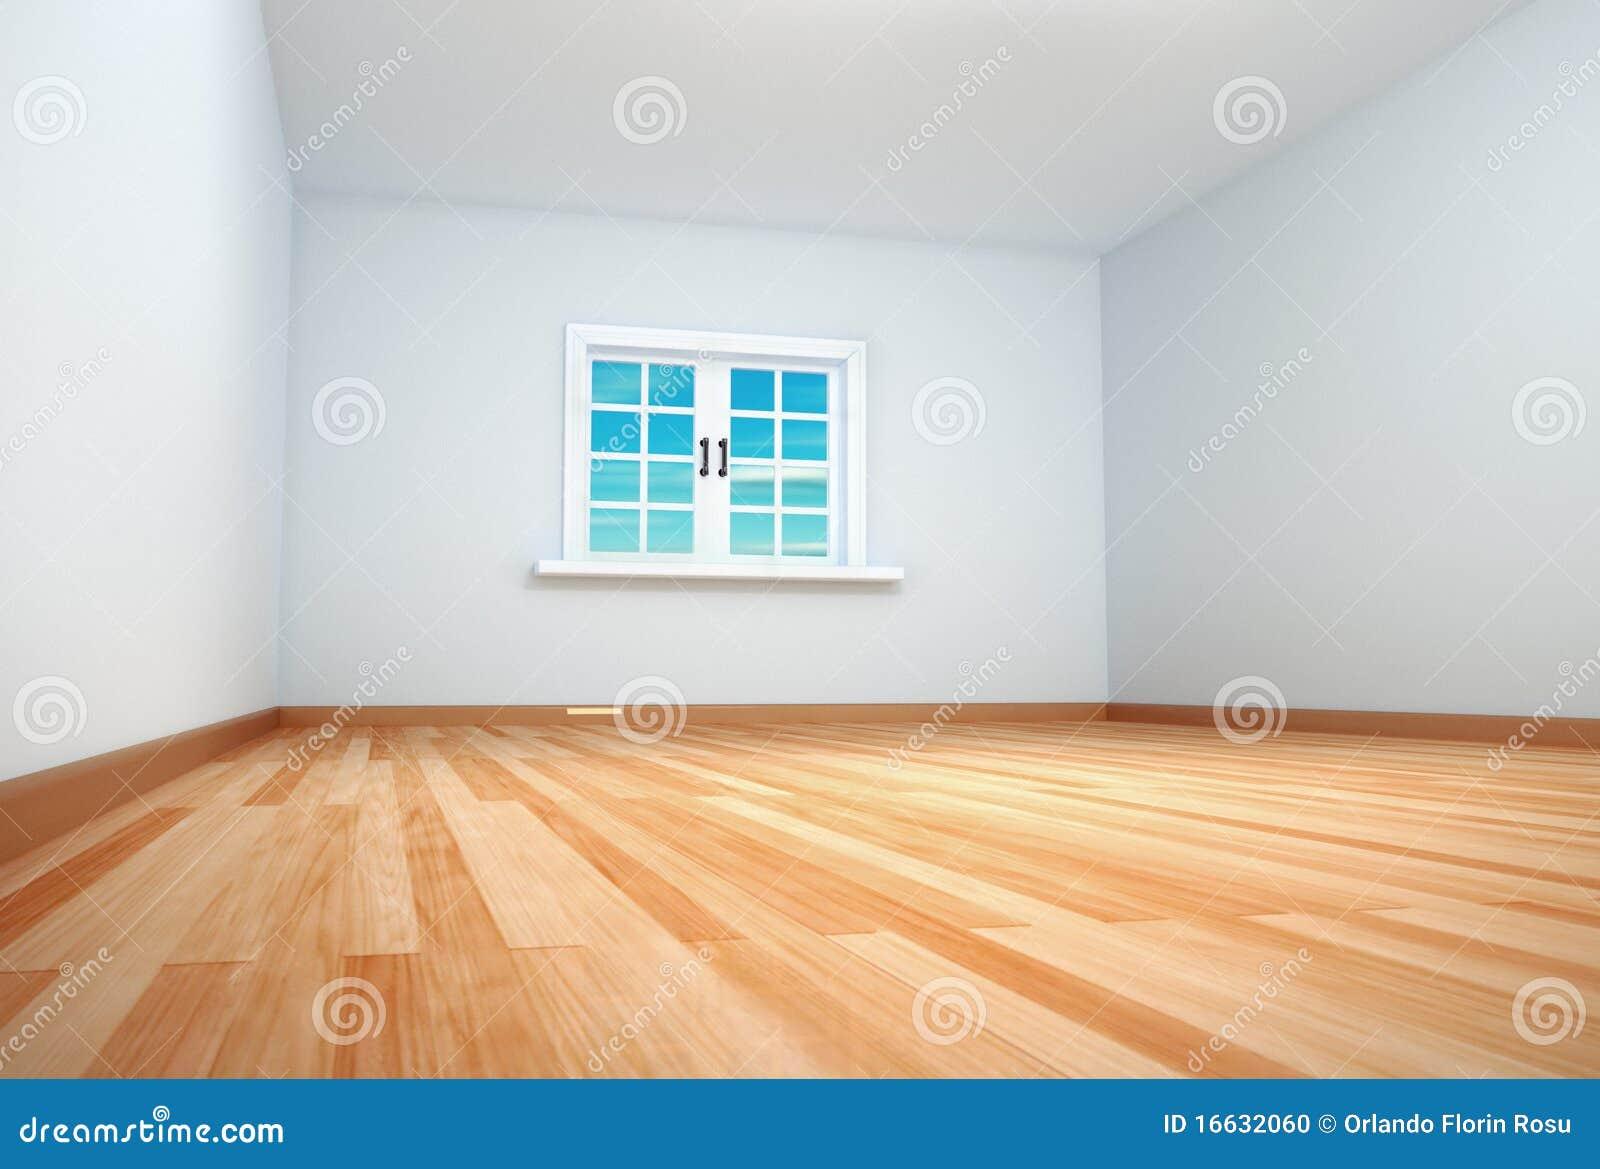 leerer raum mit dem fenster geschlossen stock abbildung bild 16632060. Black Bedroom Furniture Sets. Home Design Ideas